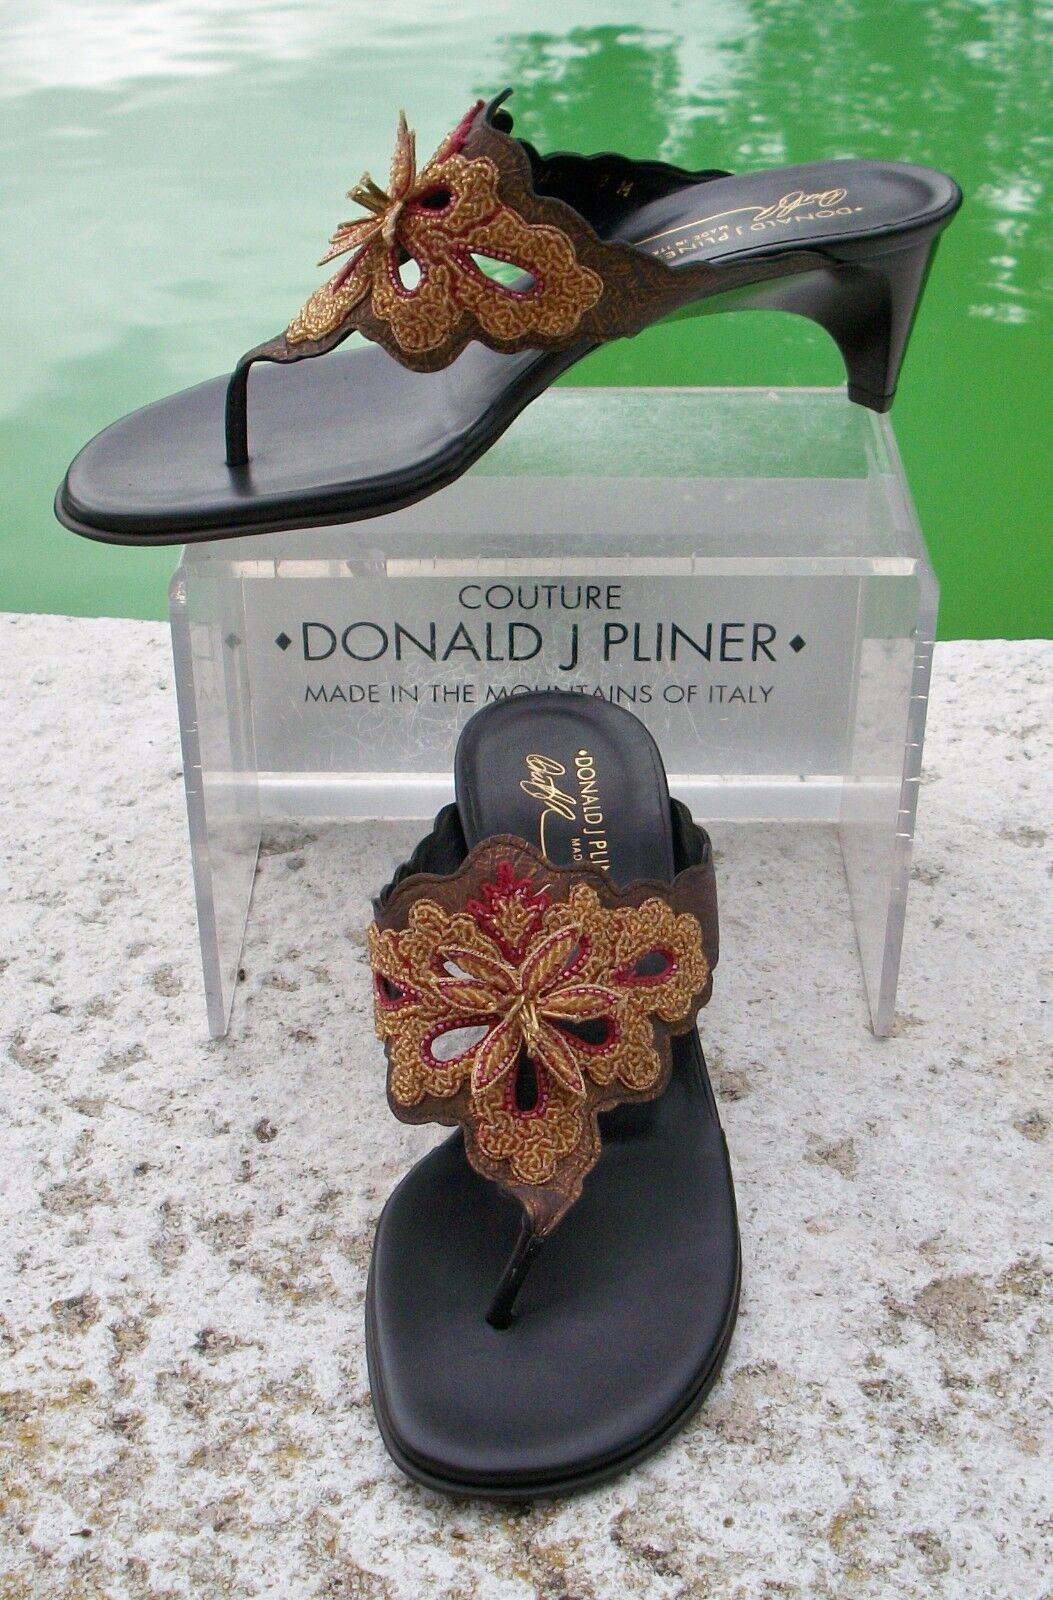 Donald Pliner Pliner Pliner Metallic Leather chaussures New Rubber Flex Sole Flat Sandal Toe  285 f4b8c0